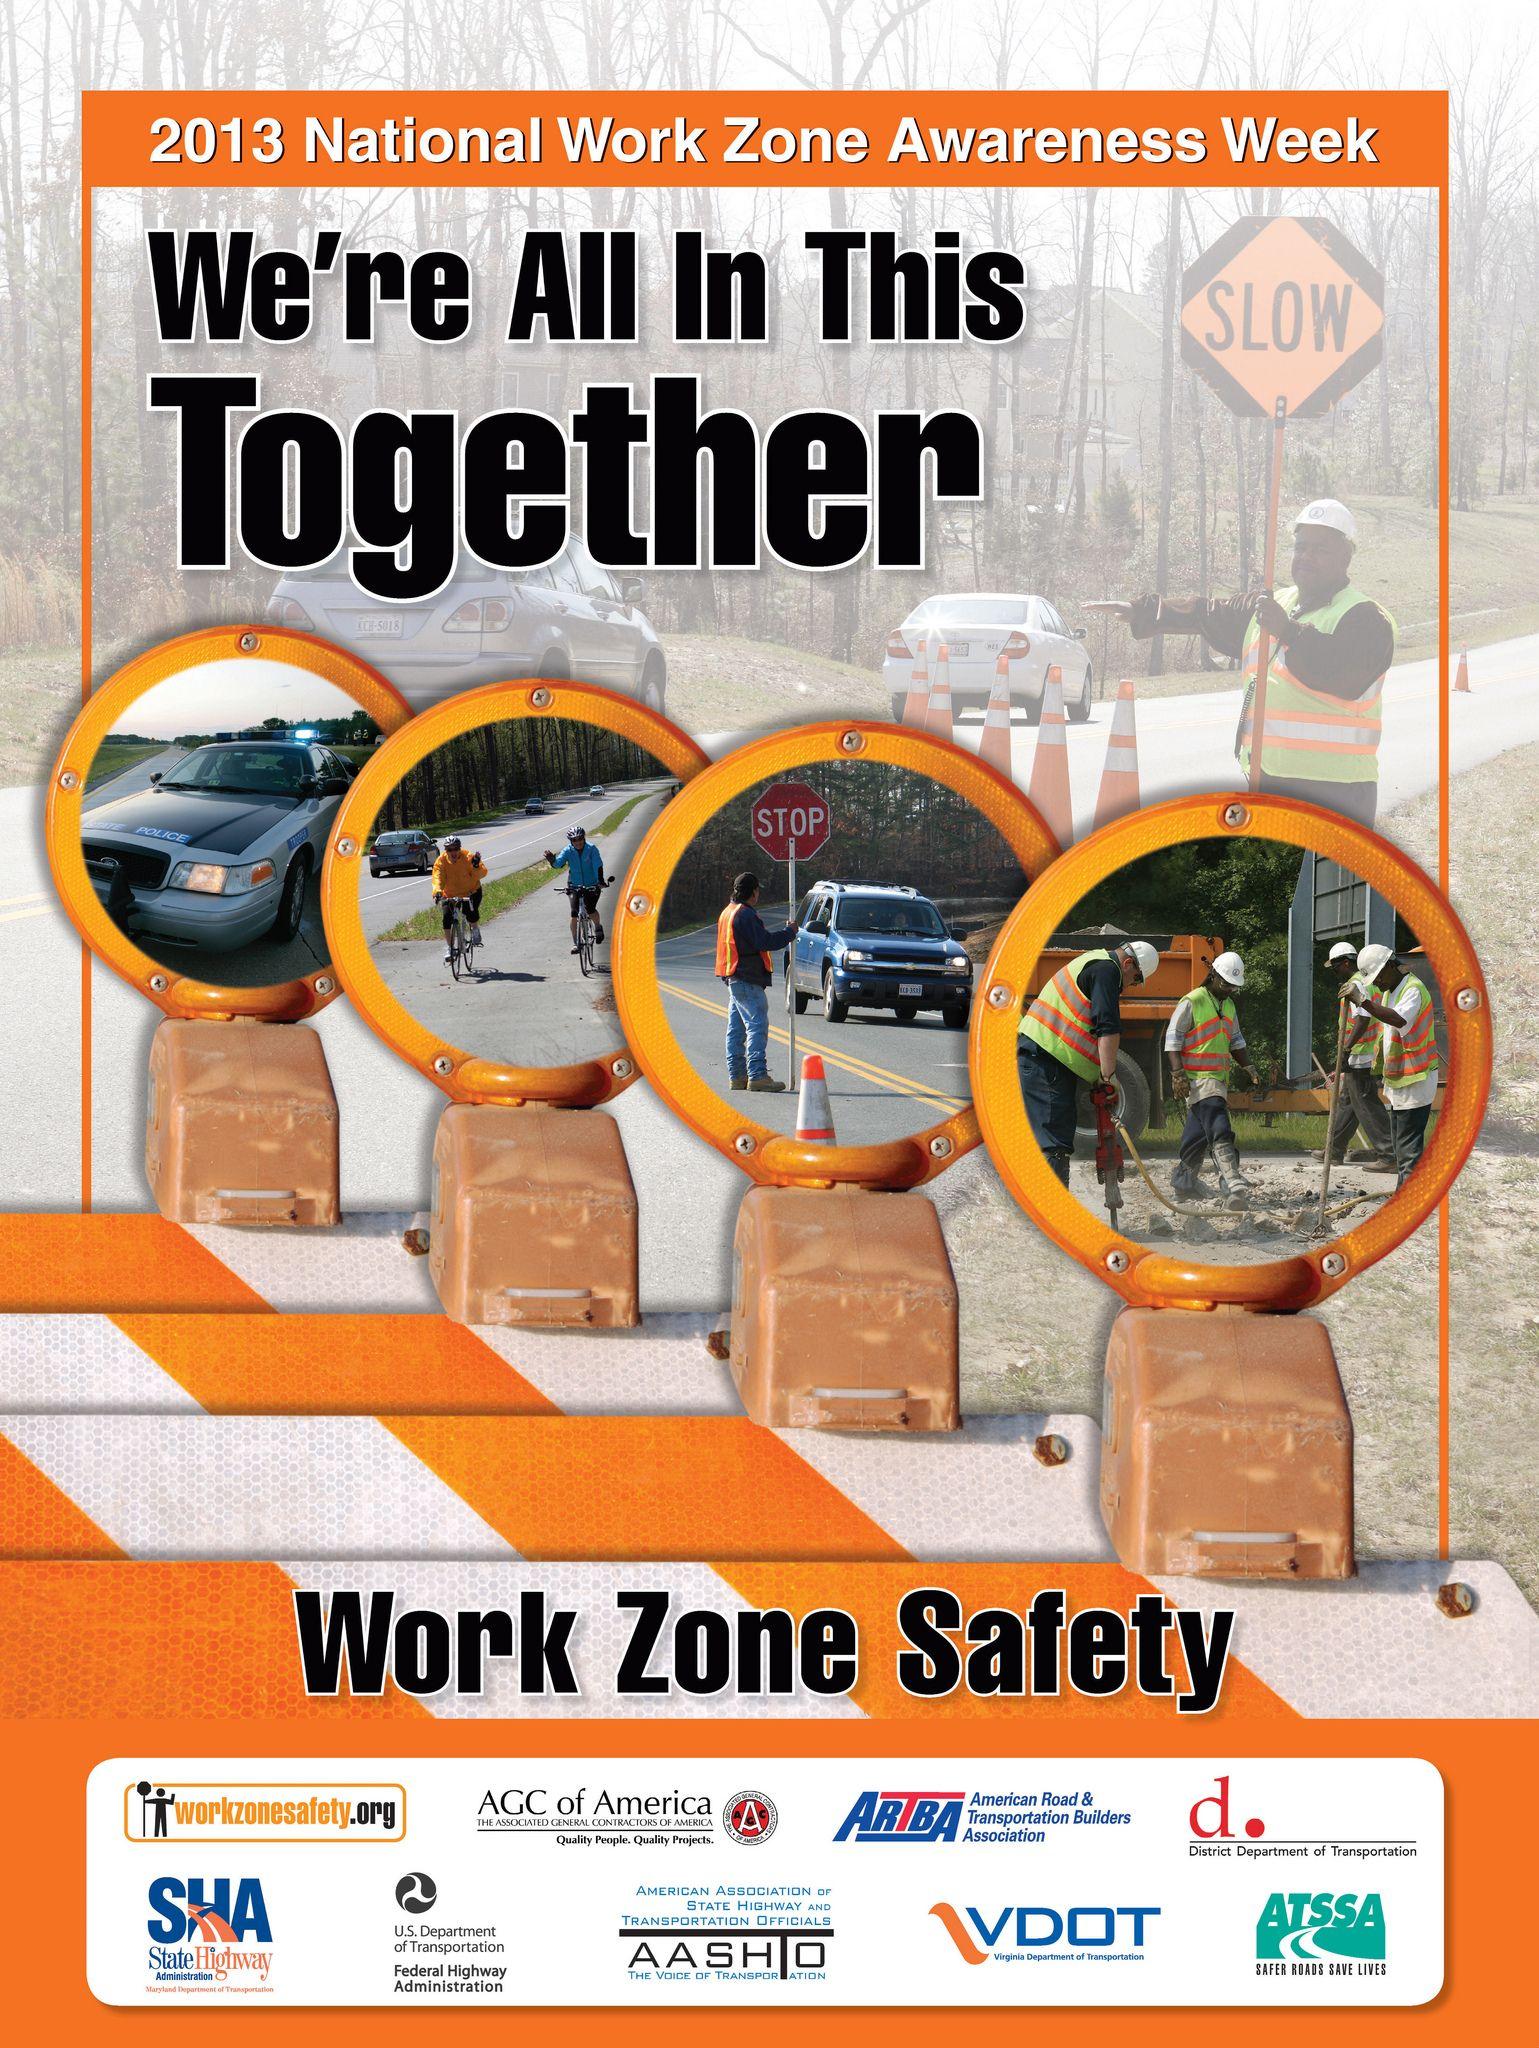 21577_Poster.pdf.pdf Safety awareness, Awareness, Safety